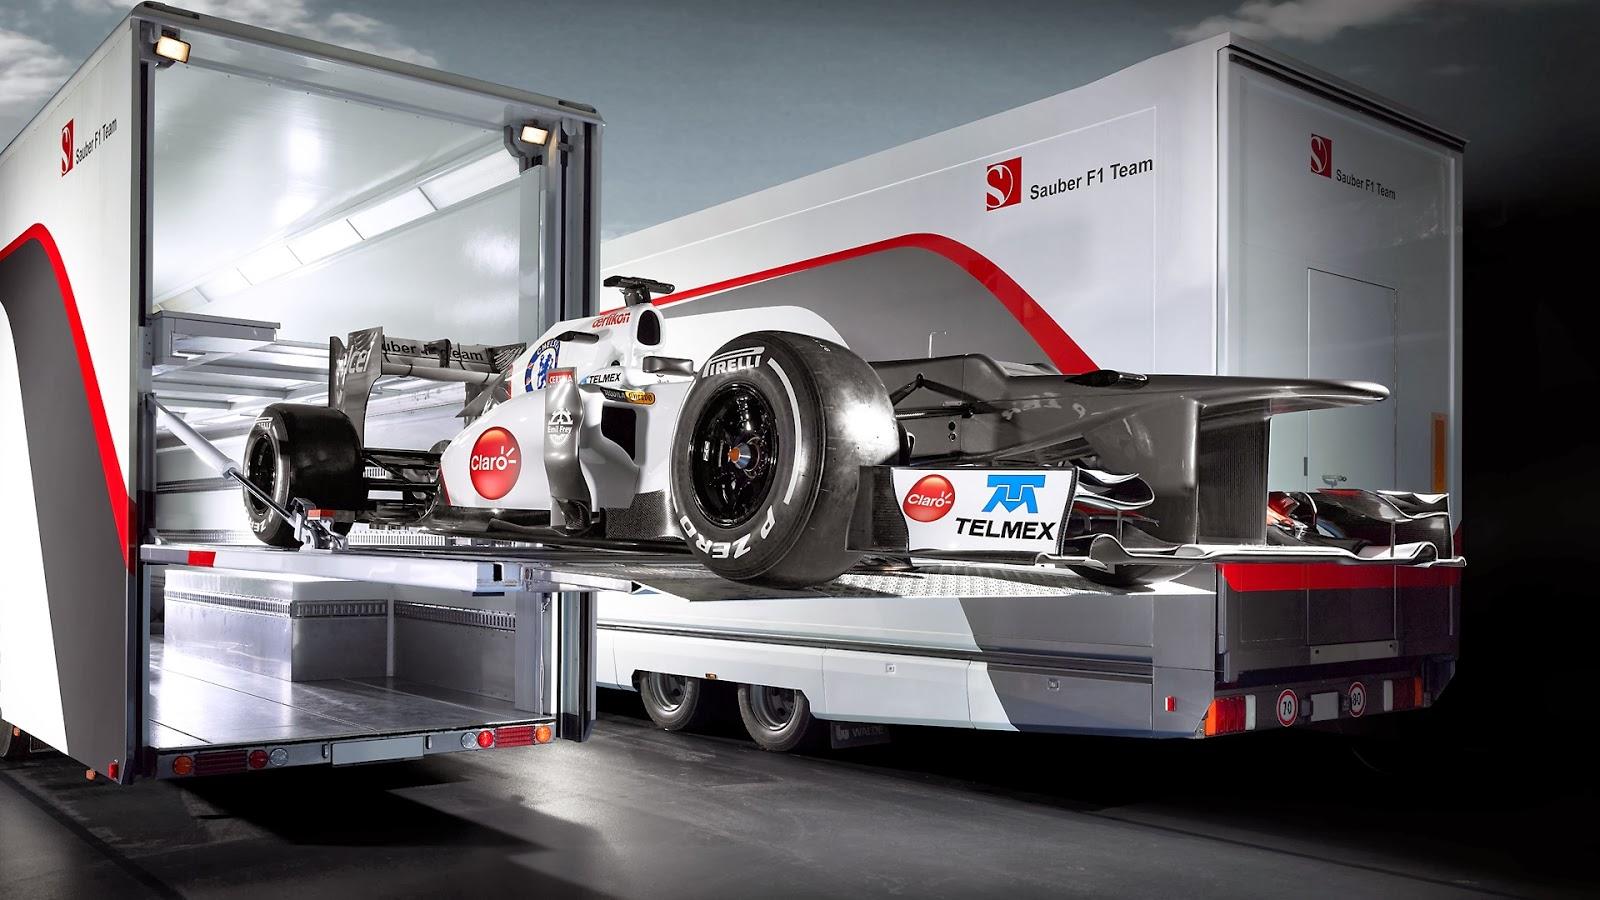 Sauber F1 Team Crew